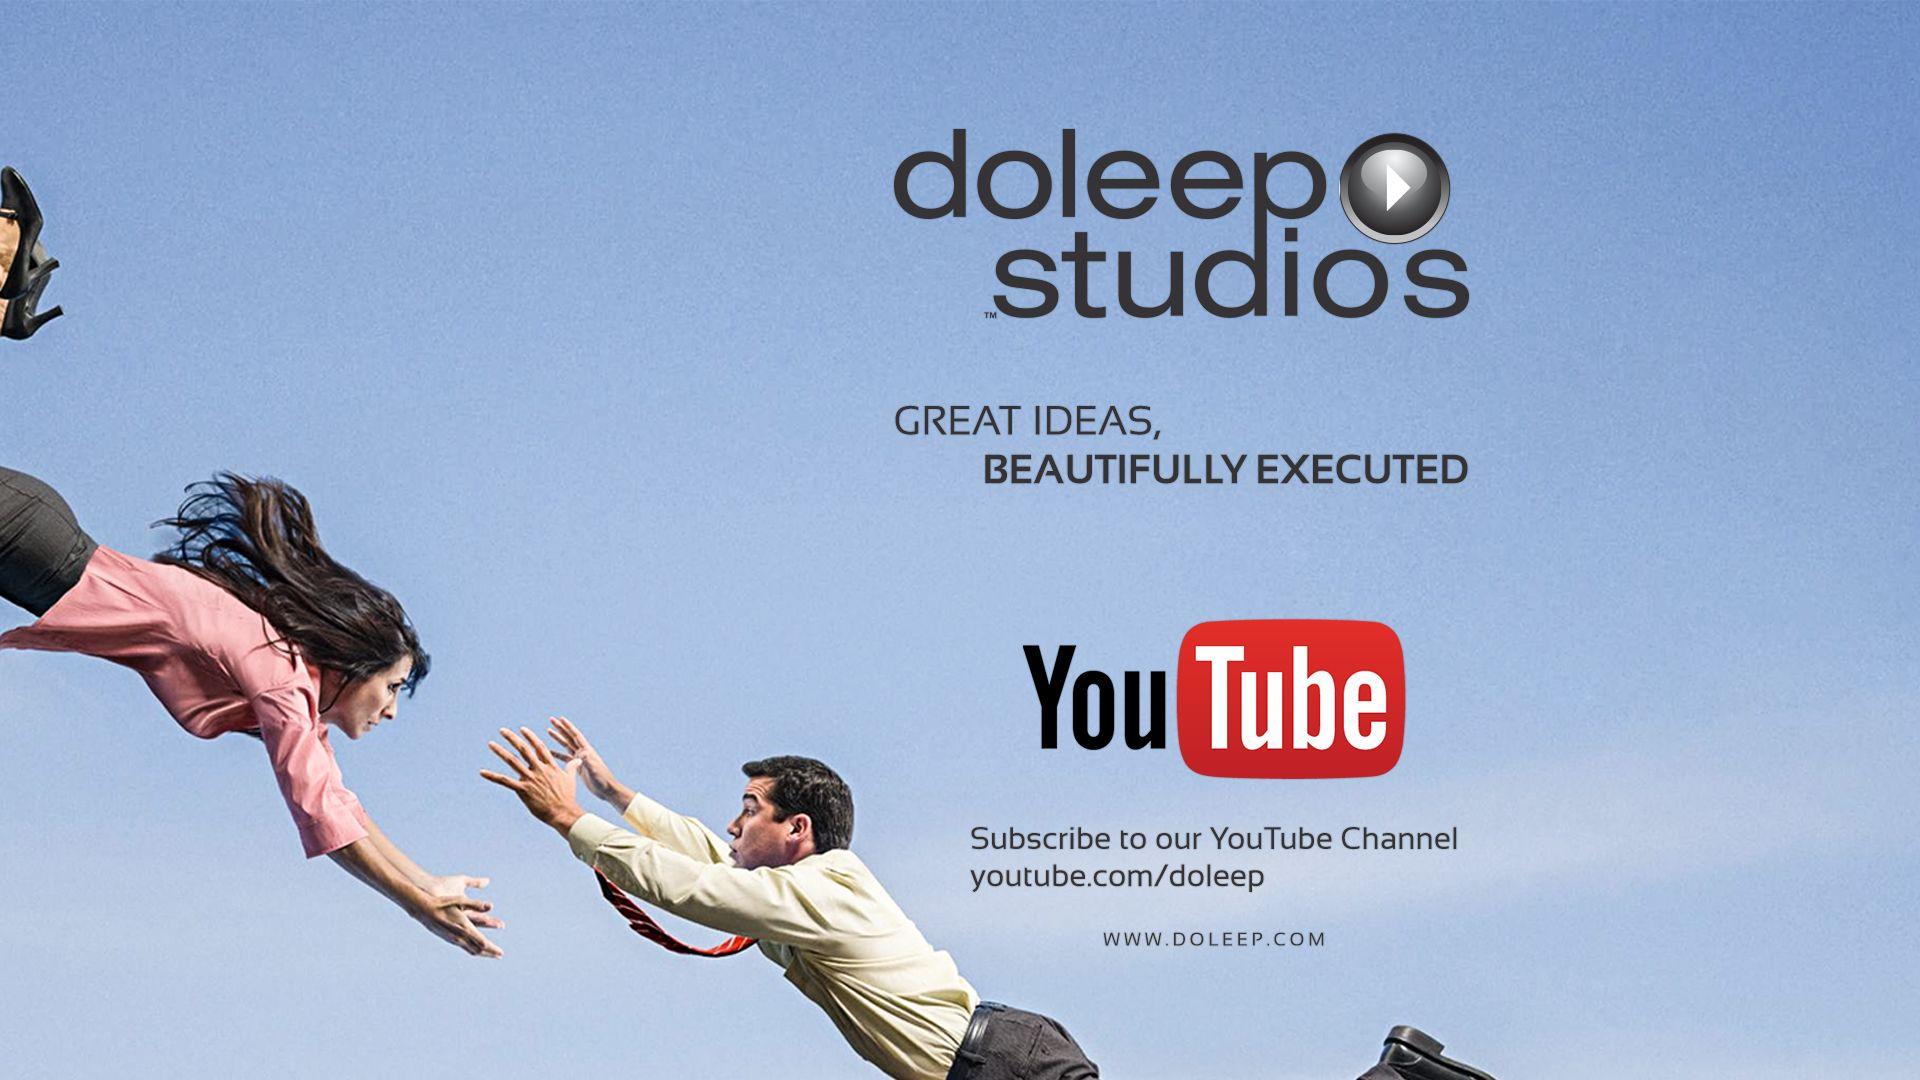 Subscribe to DoLeeP Studios YouTube Channel http://youtube.com/doleep www.doleep.com #doleepstudios #Socialmedia